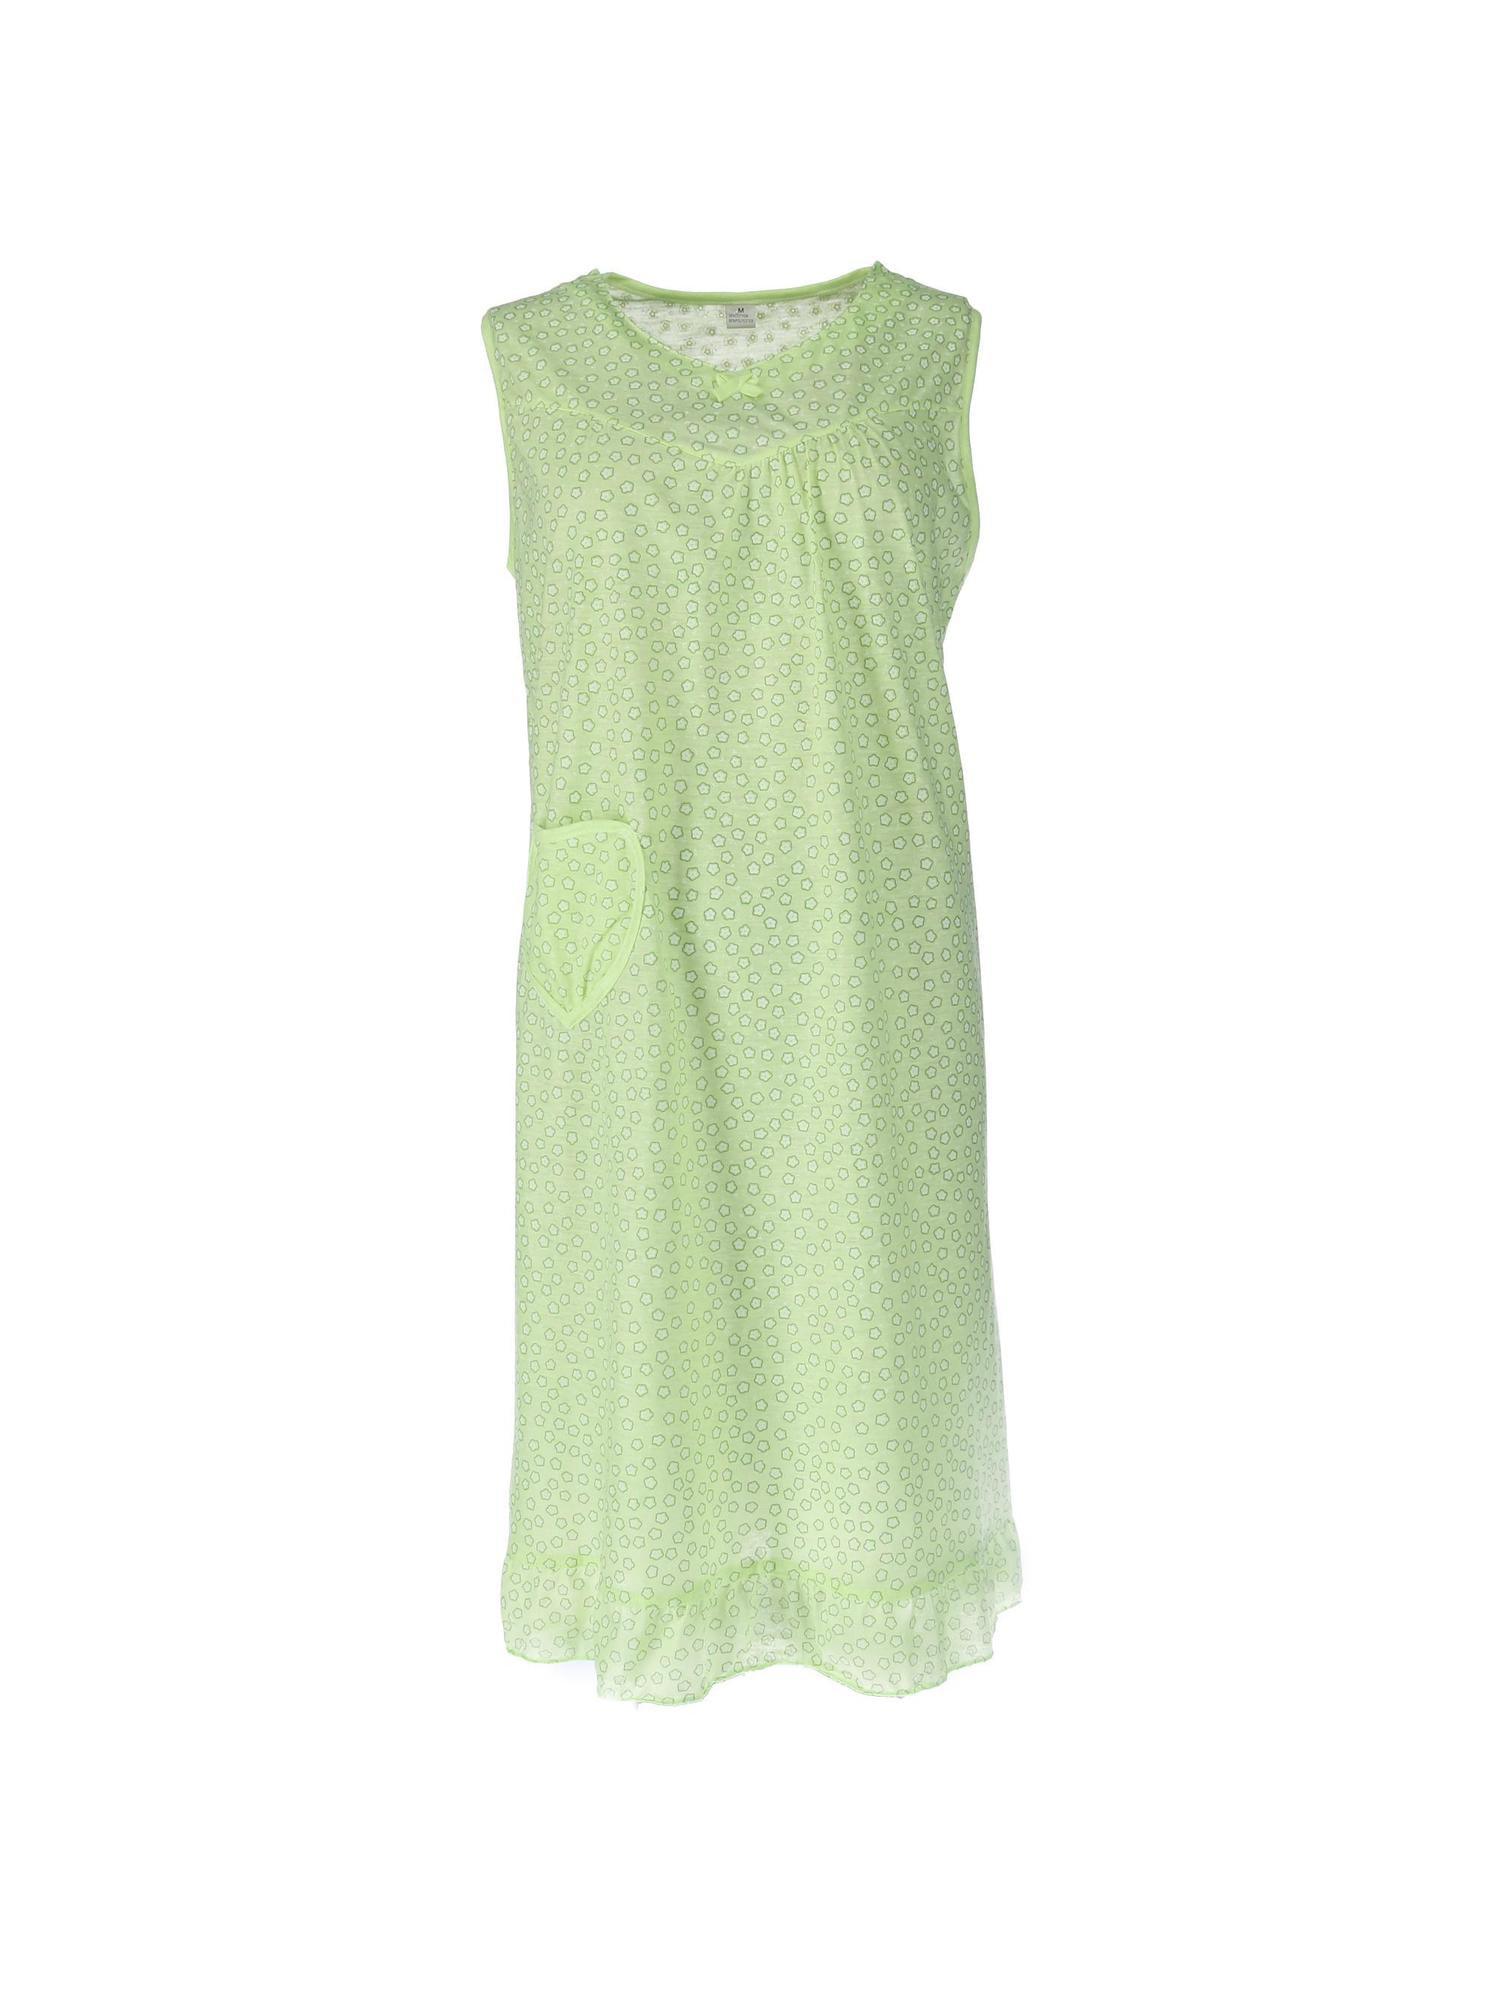 CTM Women's Sleeveless Heart Pocket Night Gown